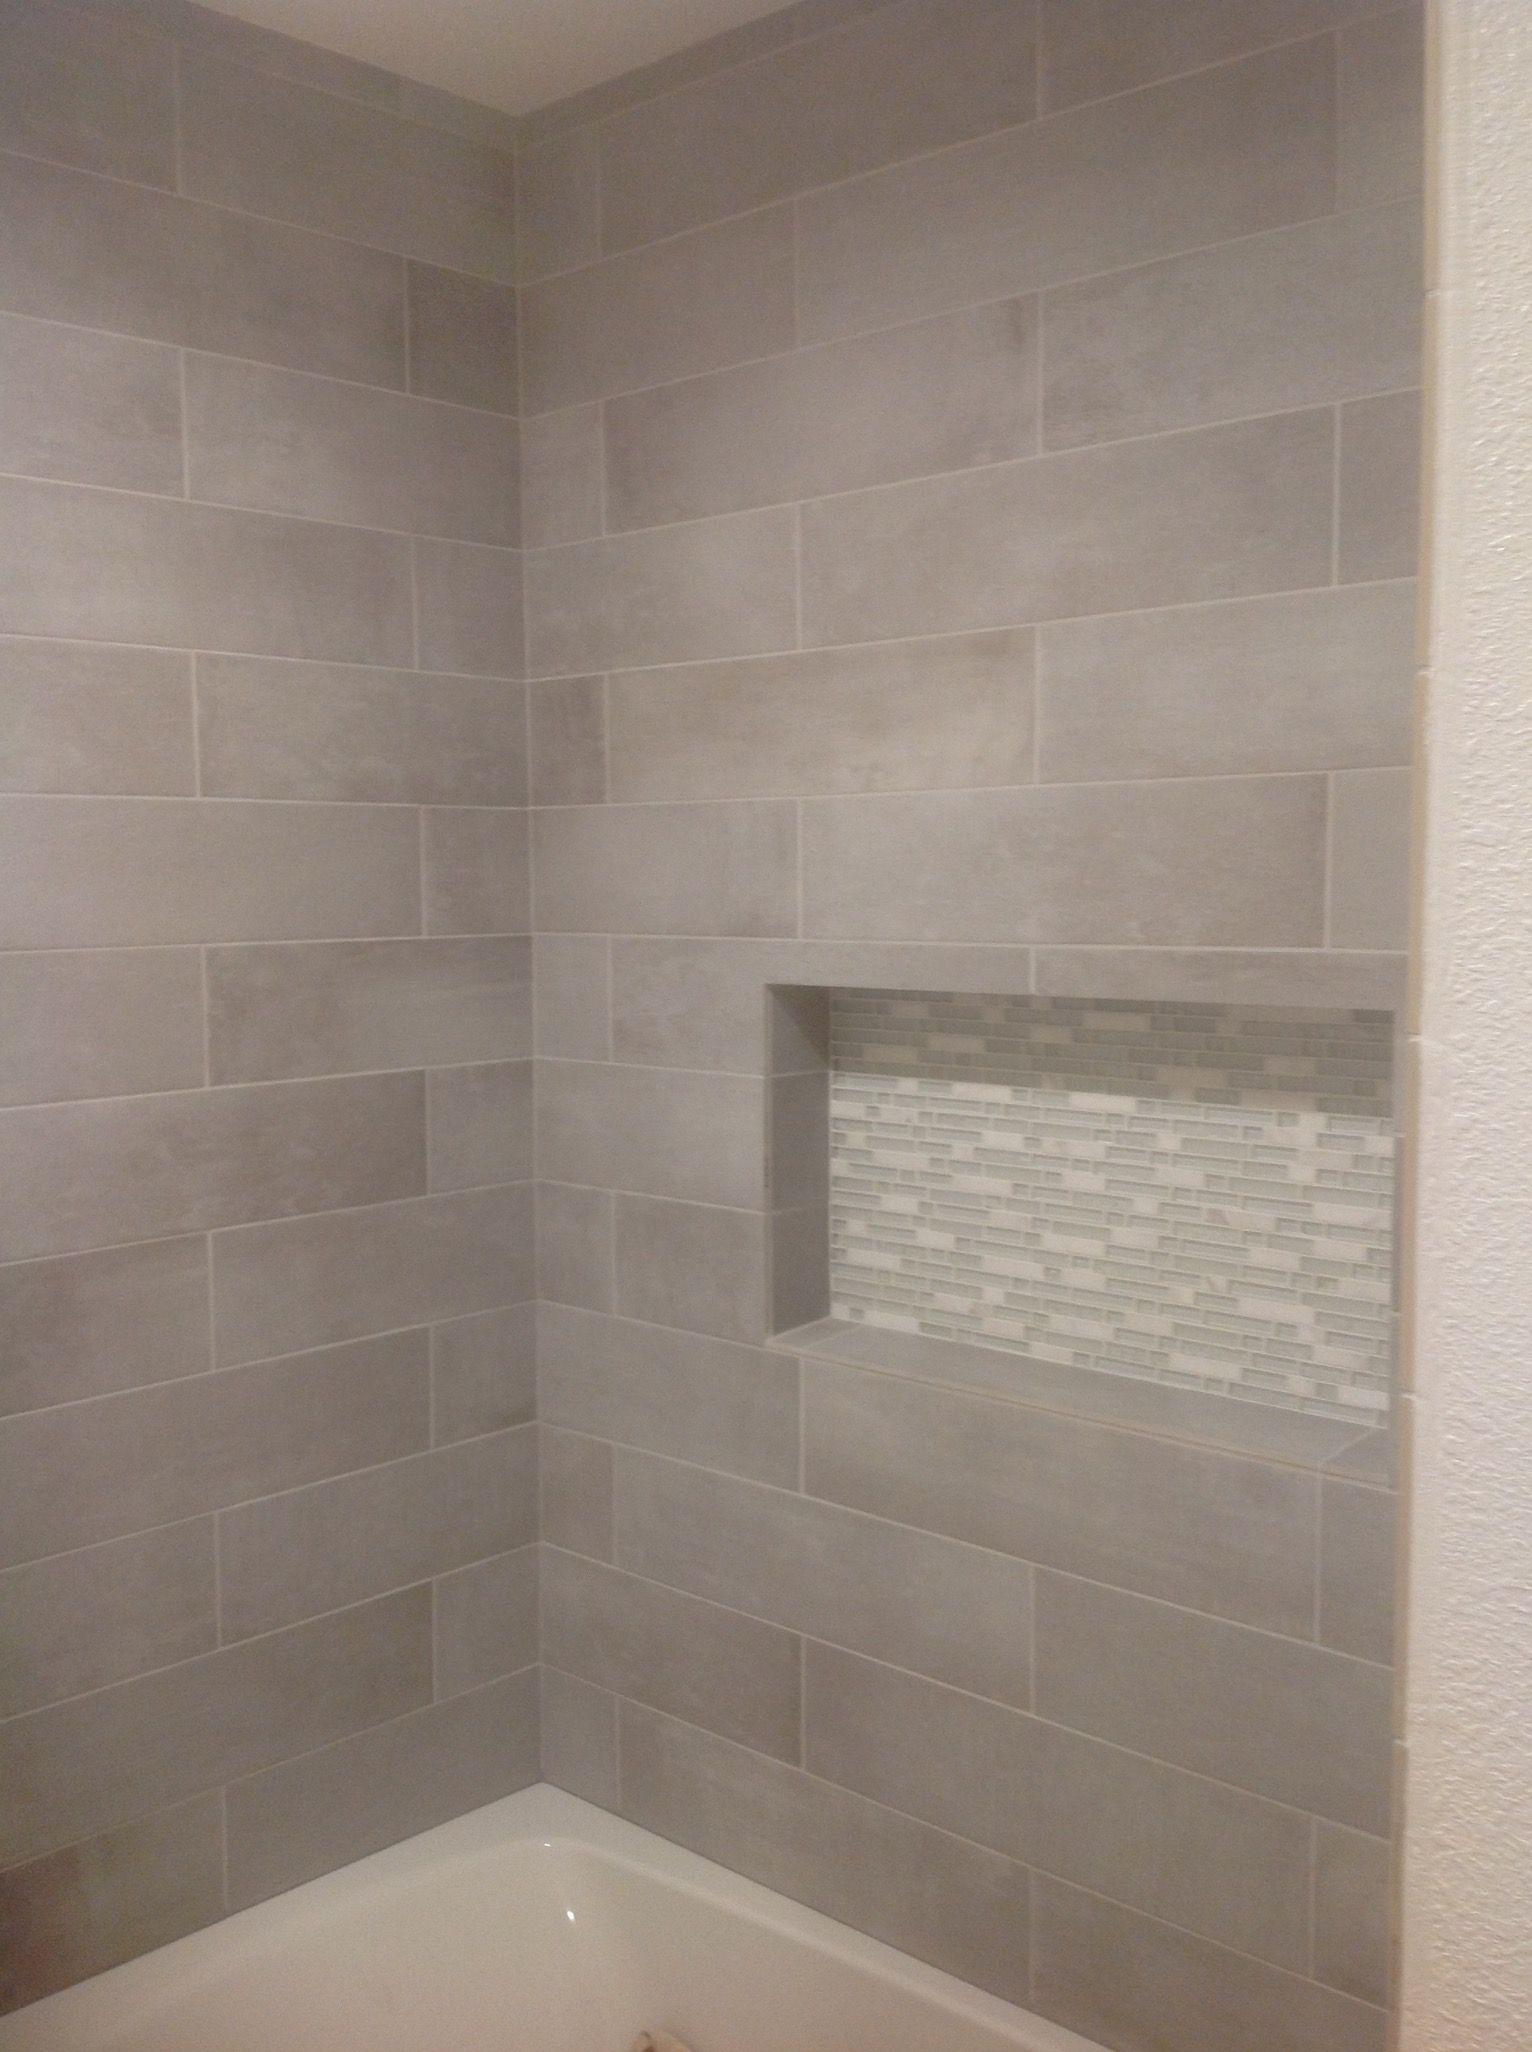 Cityside Gray Porcelain Tile From Lowes Small Bathroom Bathroom